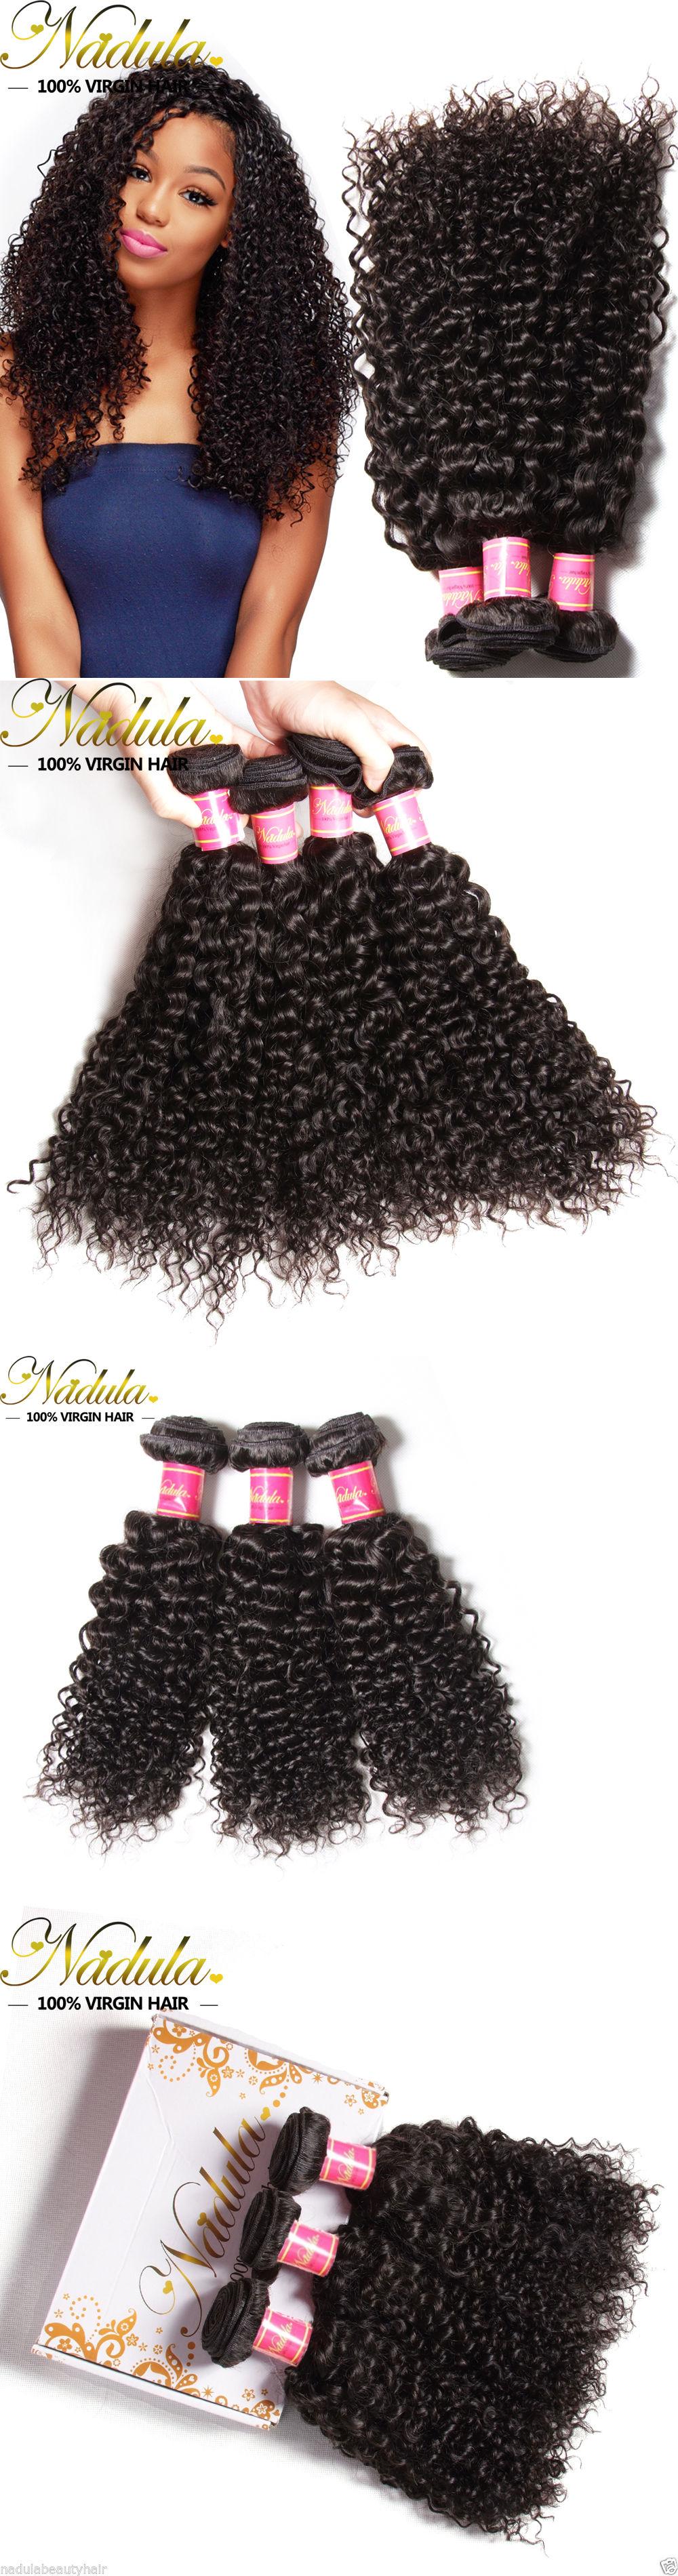 Hair Extensions Unprocessed Mongolian Curly Hair 3bundles Mongolian